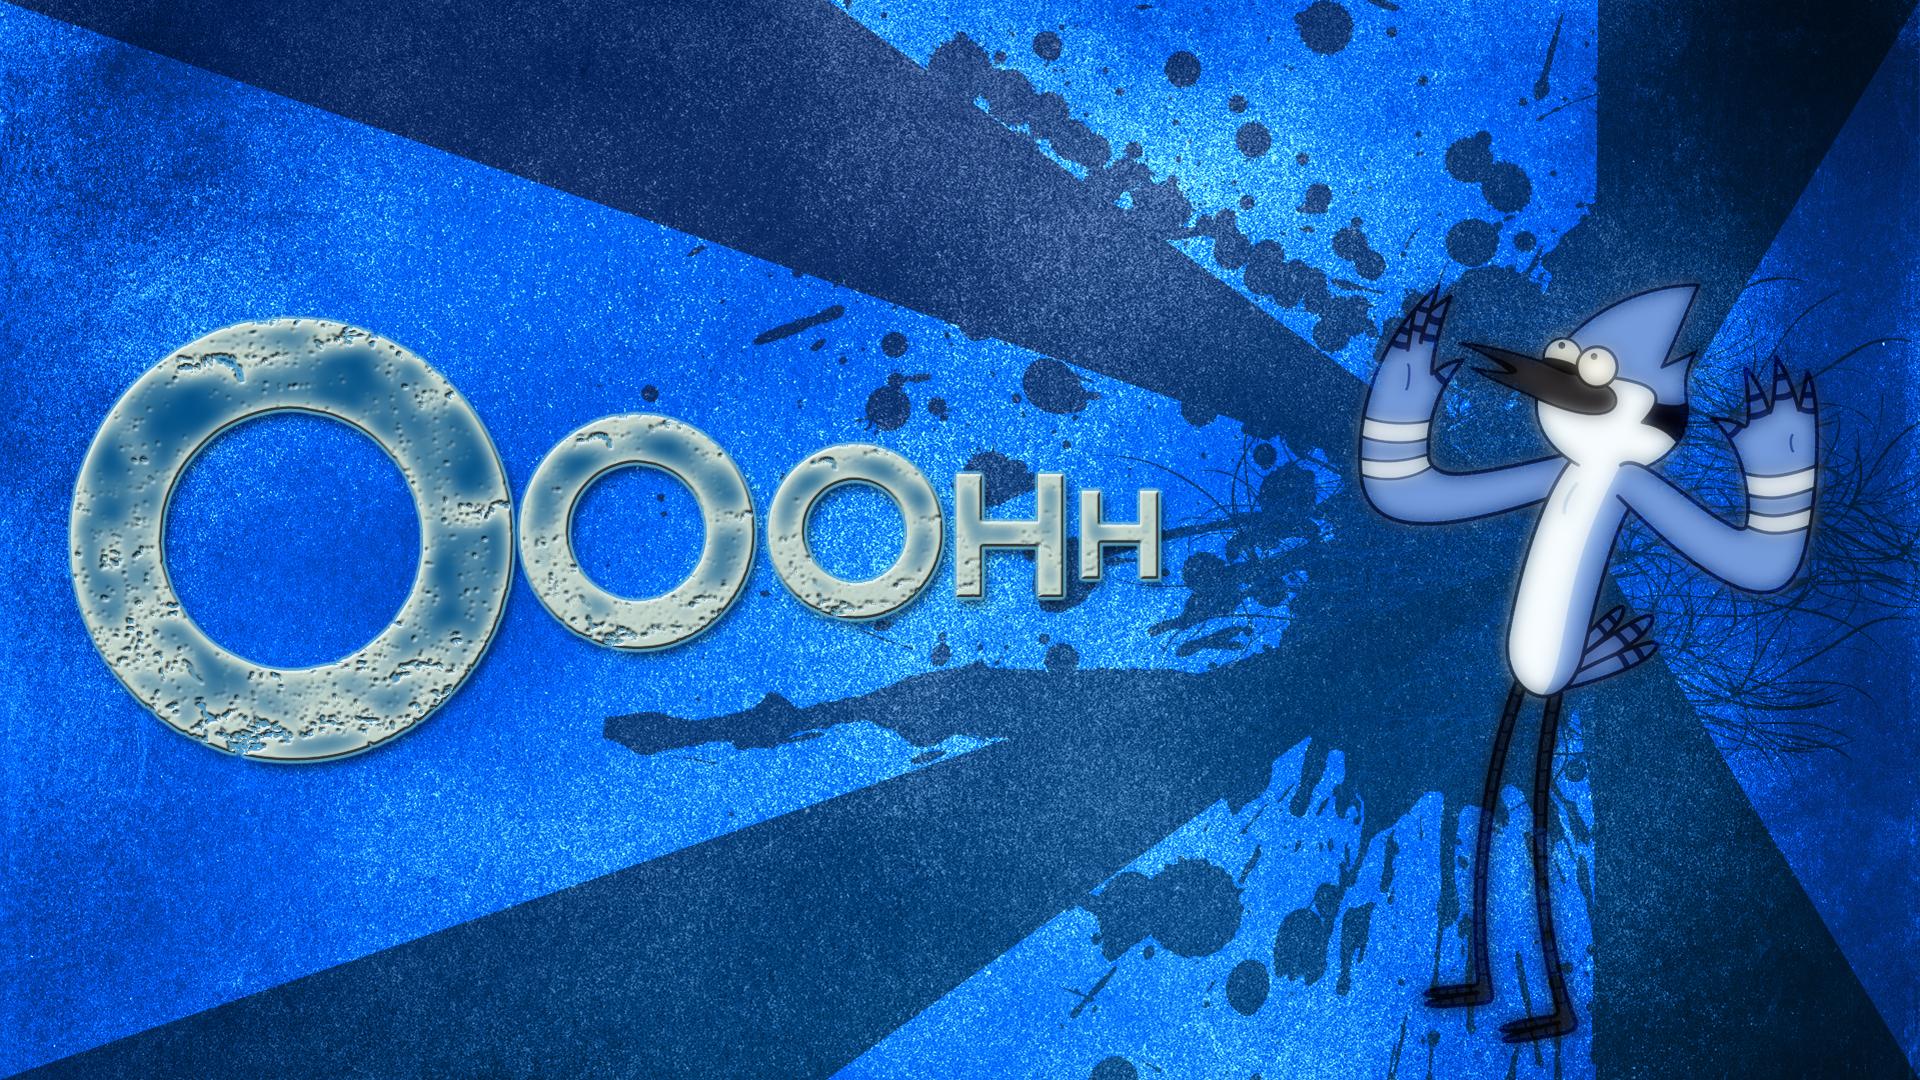 Mordecai Ooohh Wallpaper By BlueDragonHans